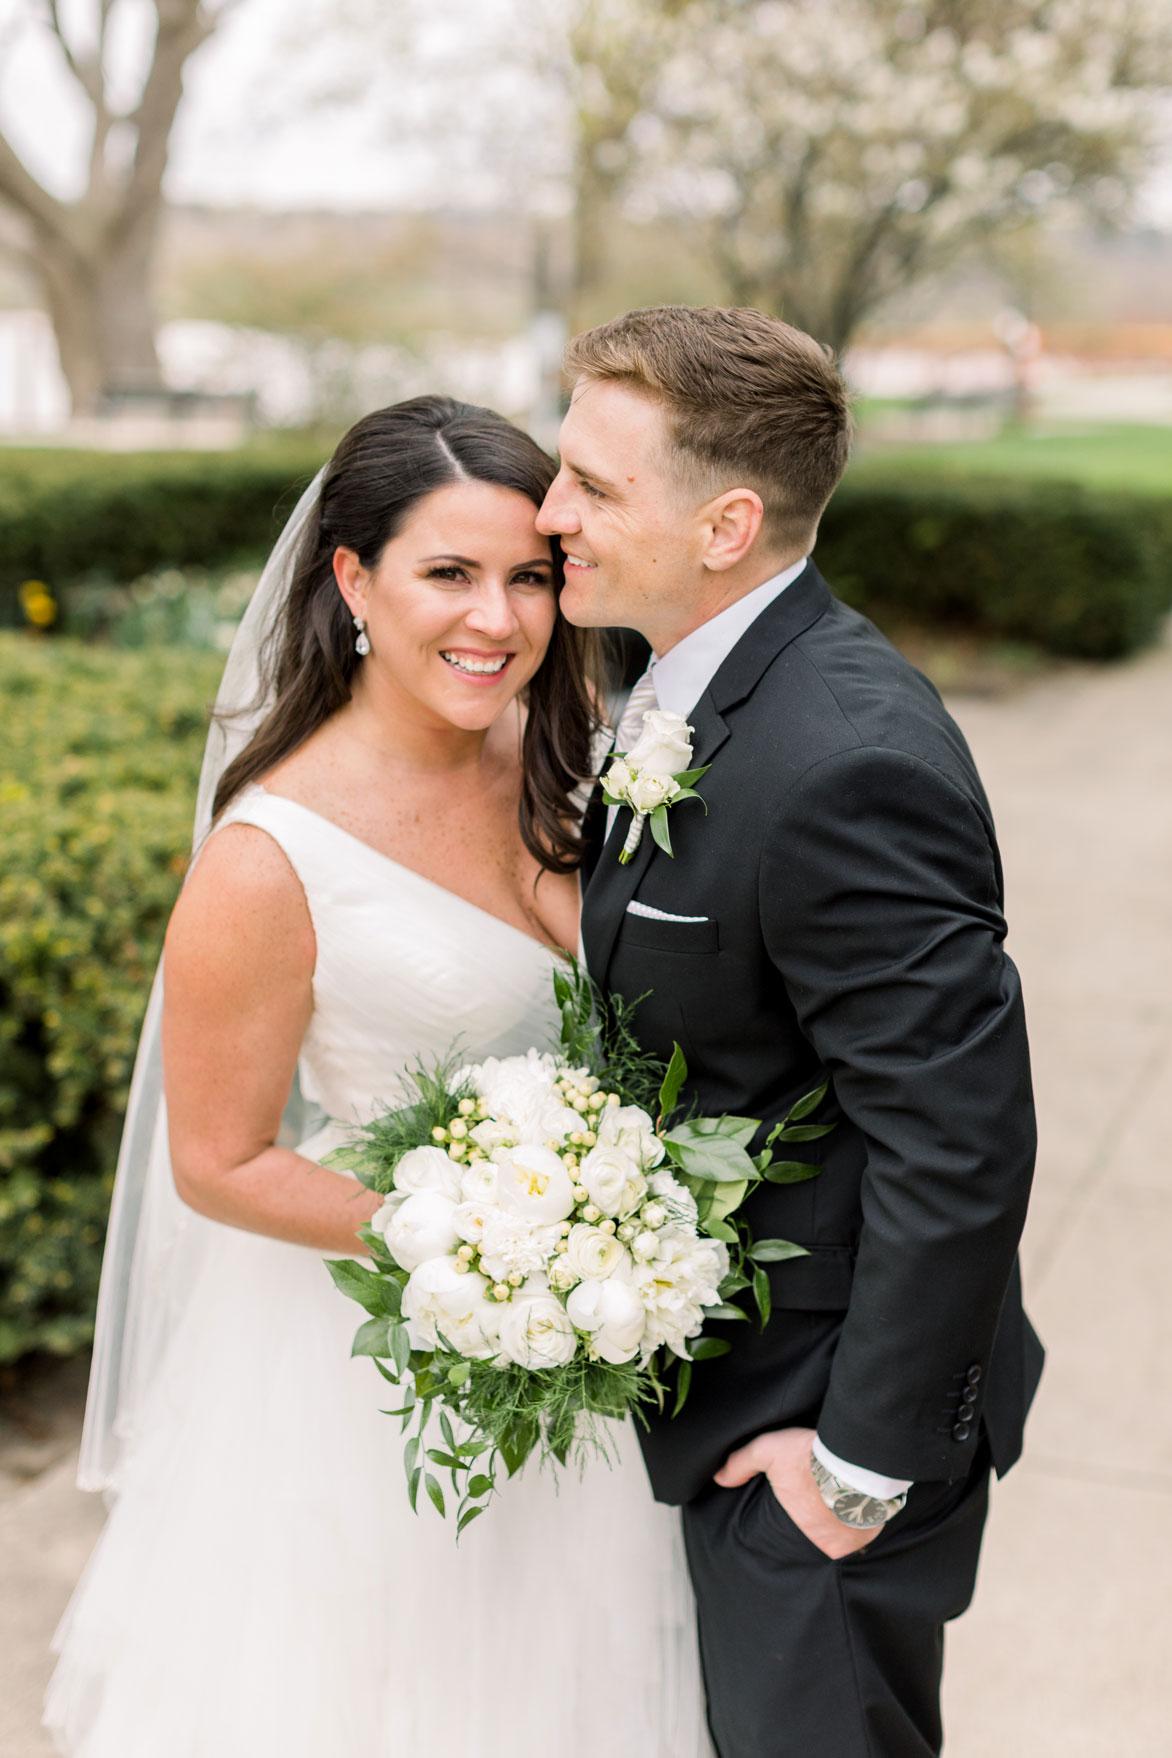 Konz-Bigaila-wedding-2017-75.jpg